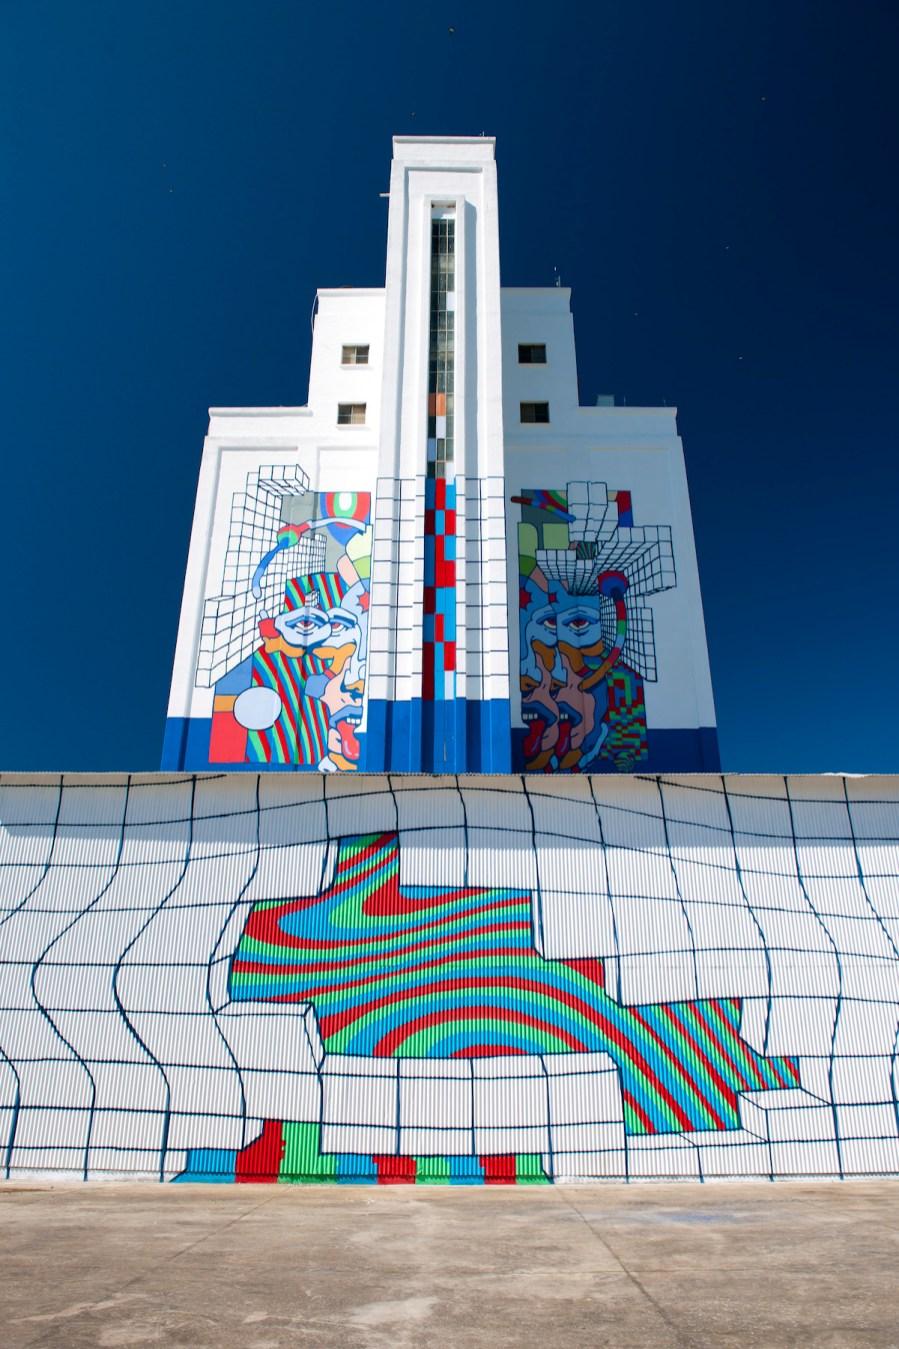 J-Demsky-Smithe-Titanes-social-inclusion-silo-street-art-museum-the-plain-of-La-Mancha-ciudad-real-pc-Elchino-Po-1